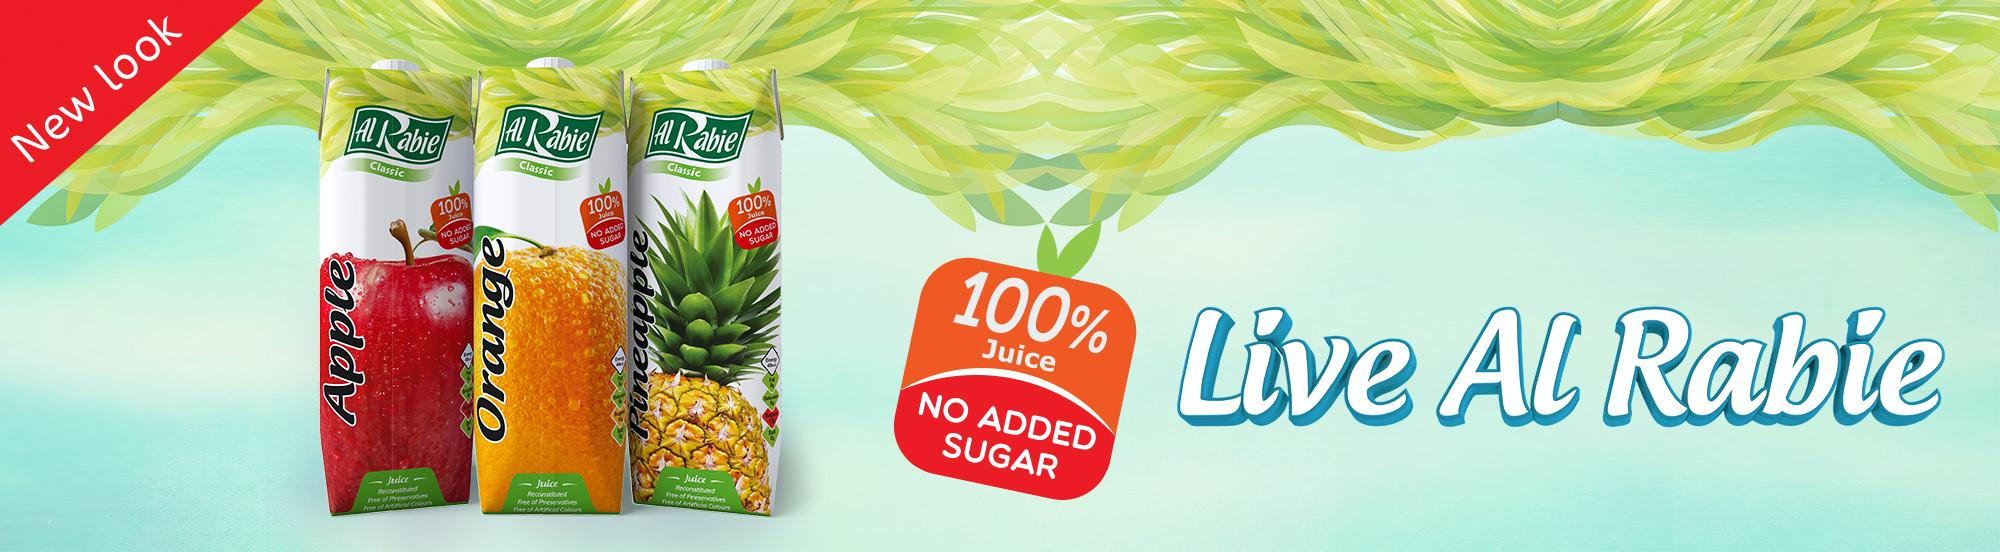 Classic Long-Life Juice / Nectar